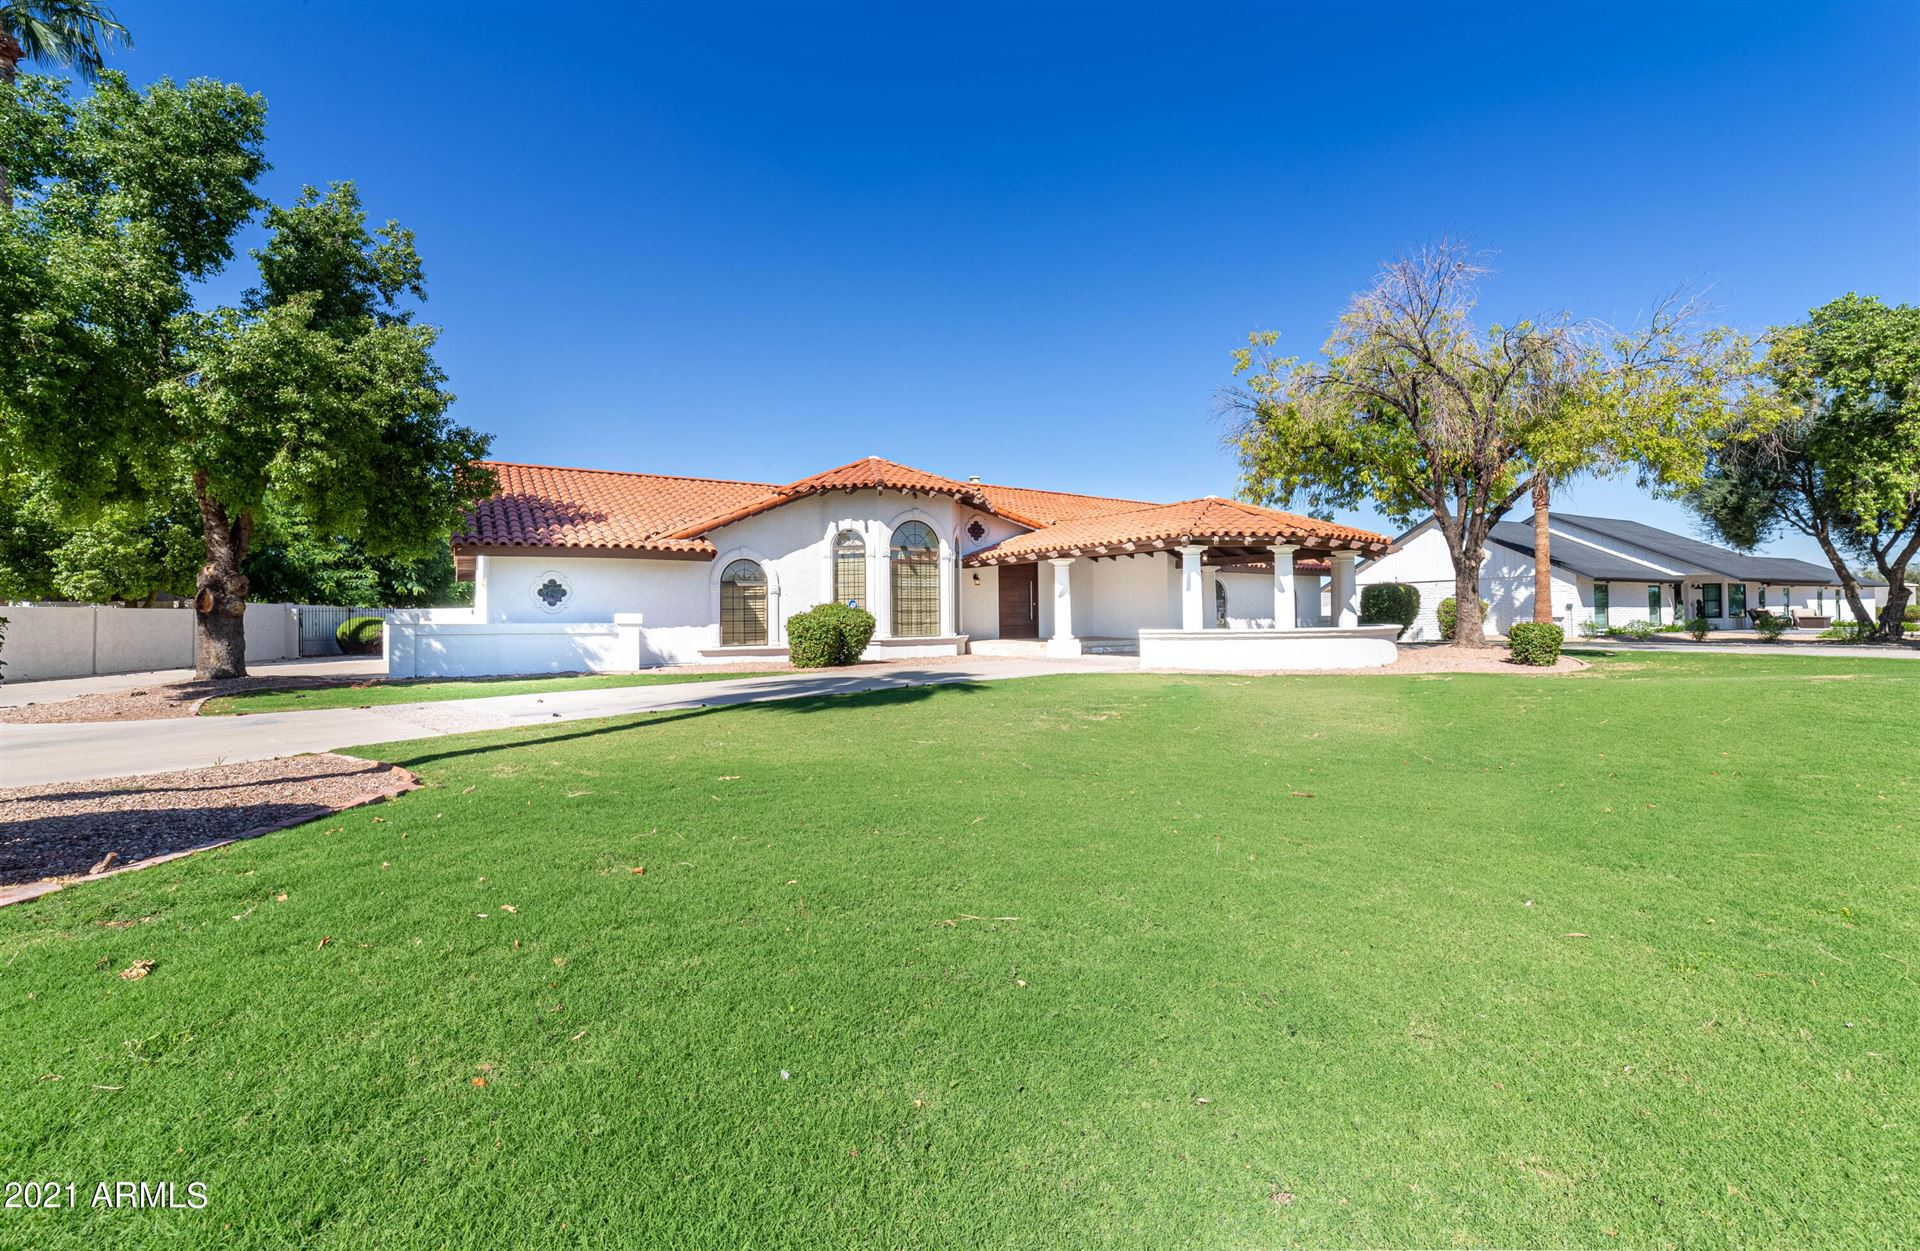 Photo of 1320 N VILLA NUEVA Drive, Litchfield Park, AZ 85340 (MLS # 6307587)